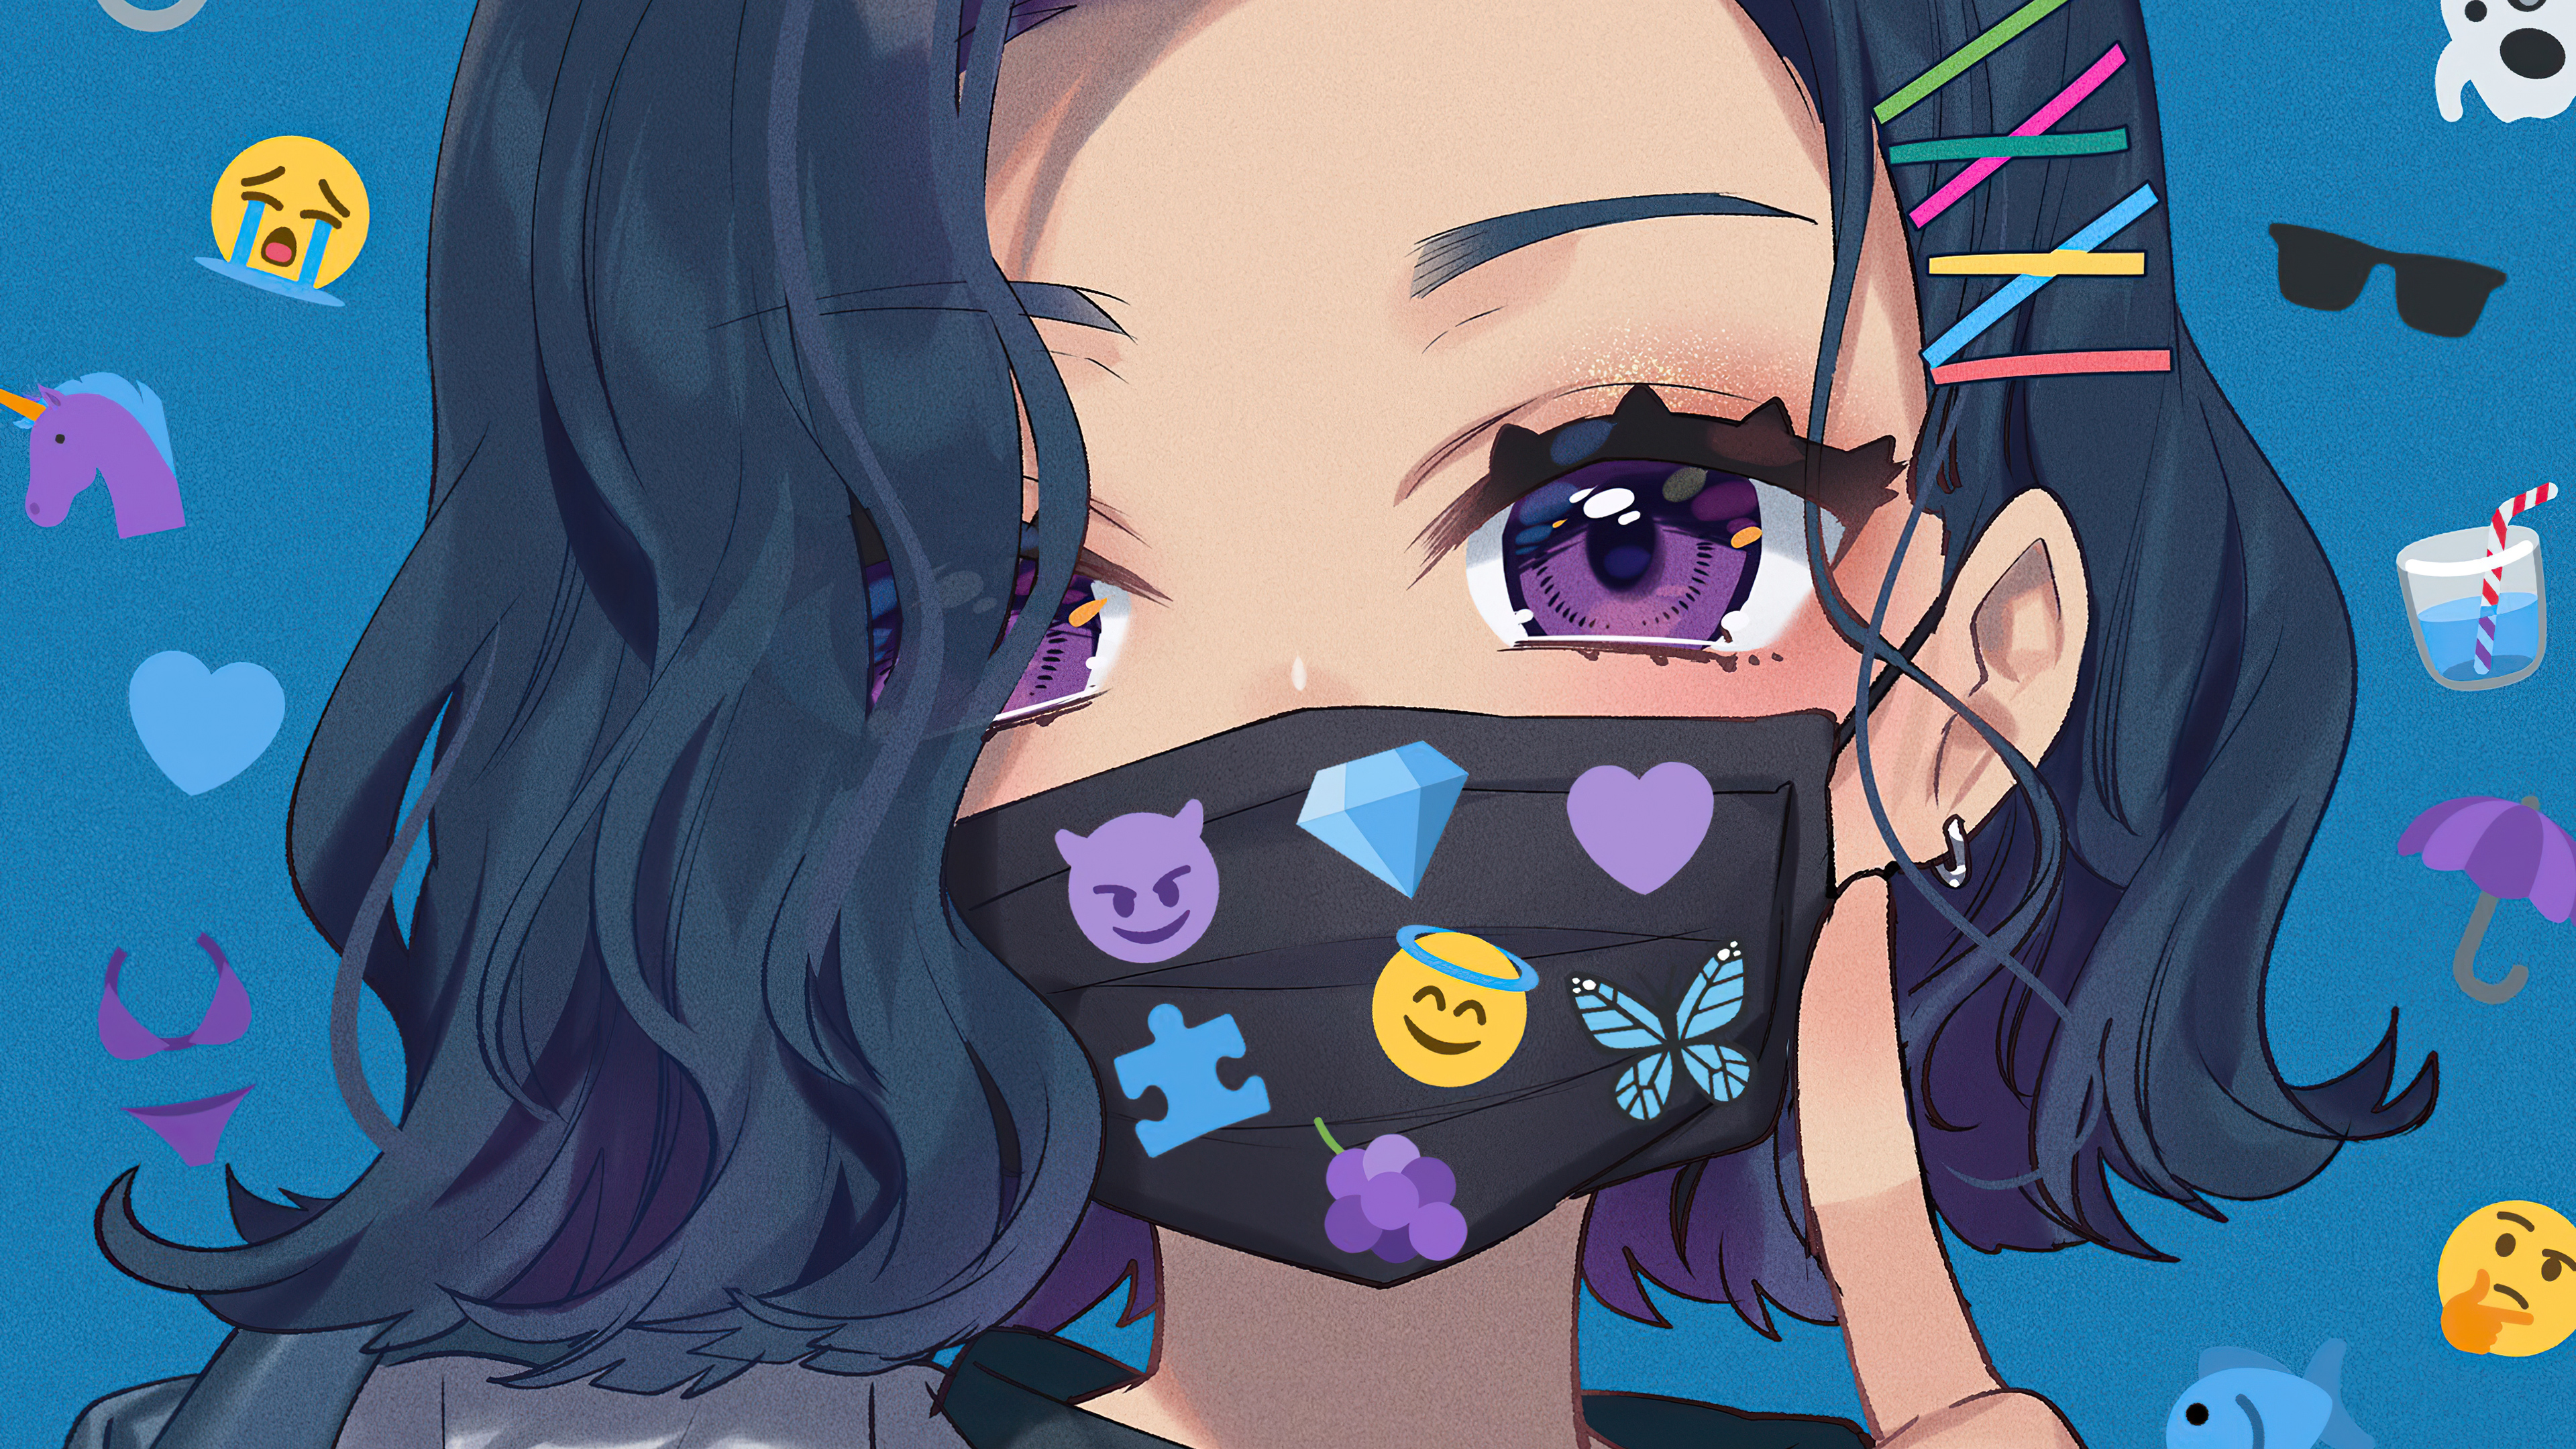 Anime Girl Big Eyes Tattoo Mask 4k Hd Anime 4k Wallpapers